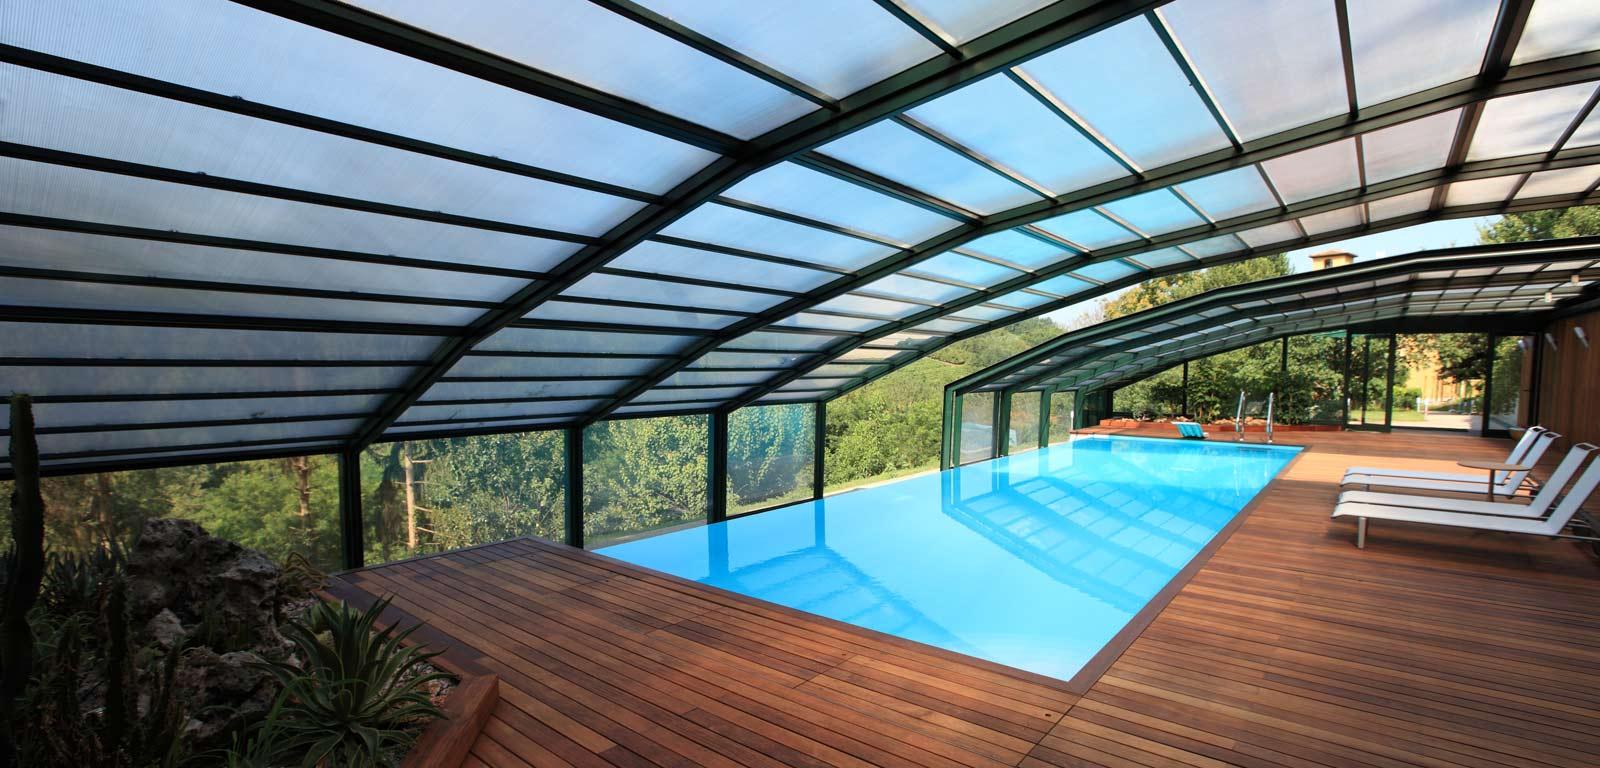 Coperture per piscine  Accessori  Manutenzione - TGS Piscine